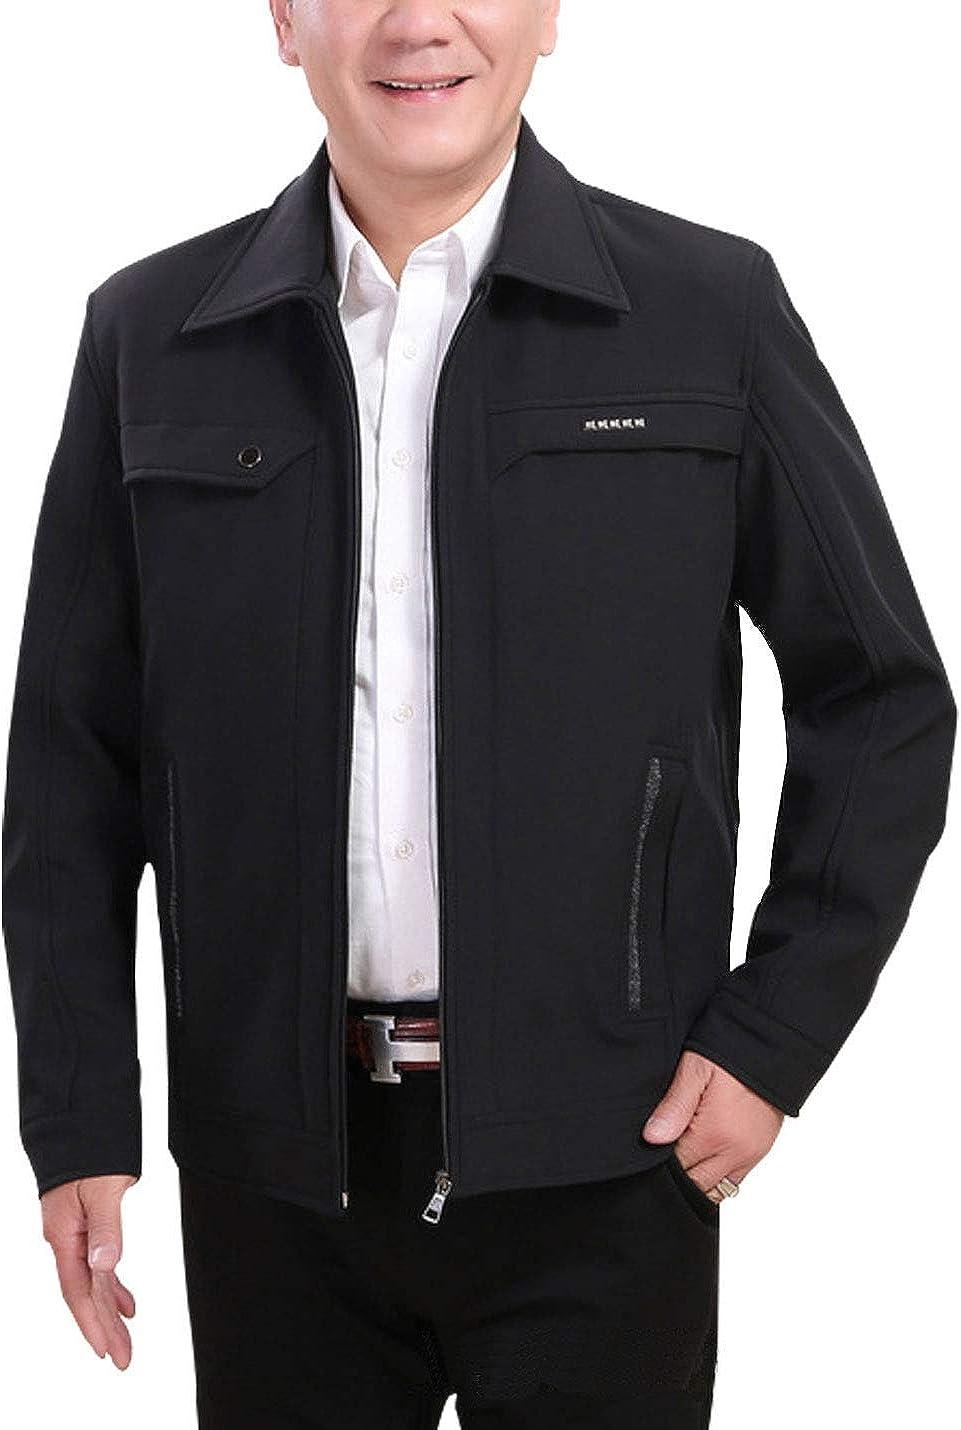 Omoone Men's Long Sleeves Solid Fleece Lined Cotton Jacket Outwear